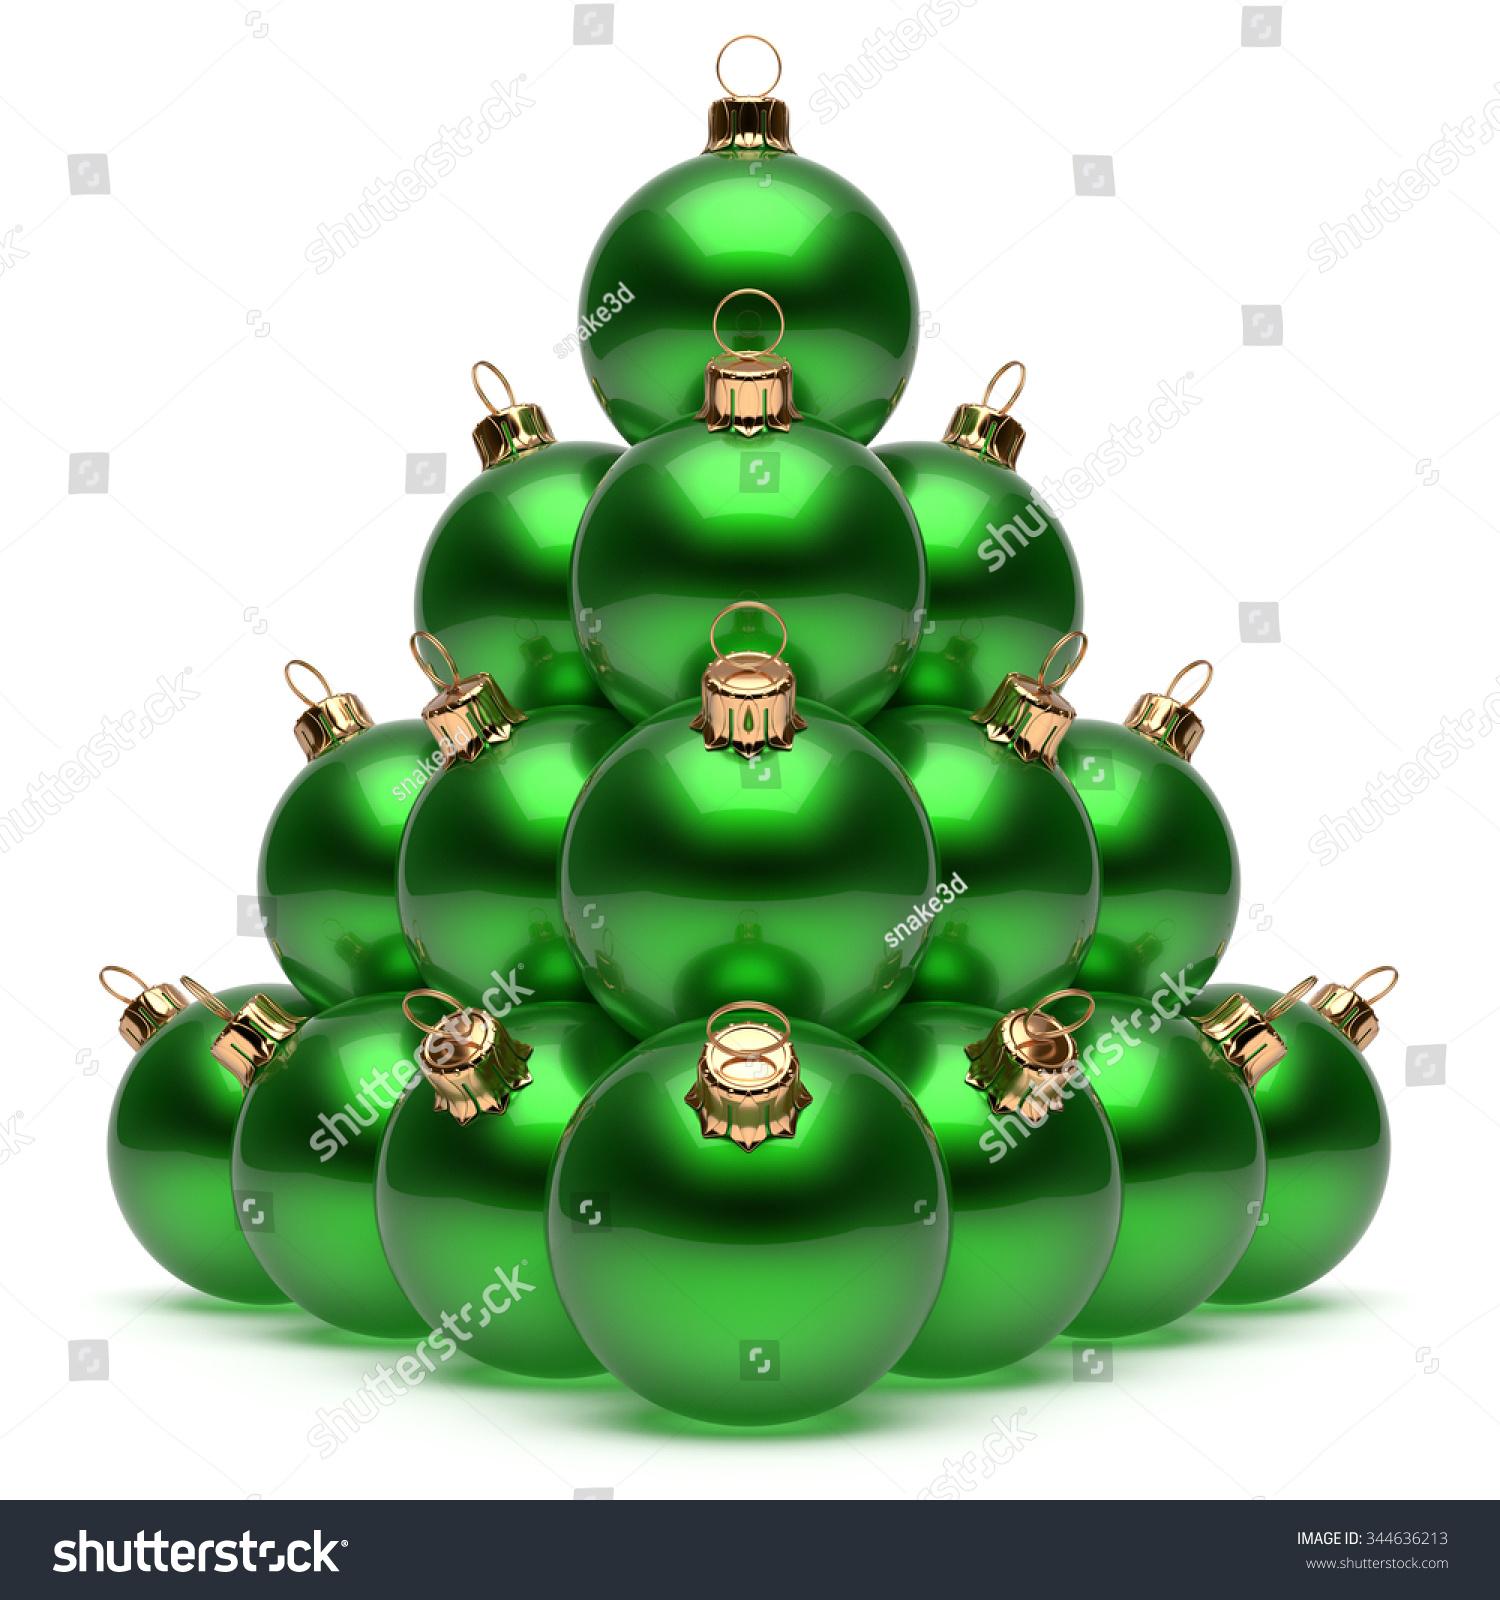 Pyramid christmas ornament - Save To A Lightbox